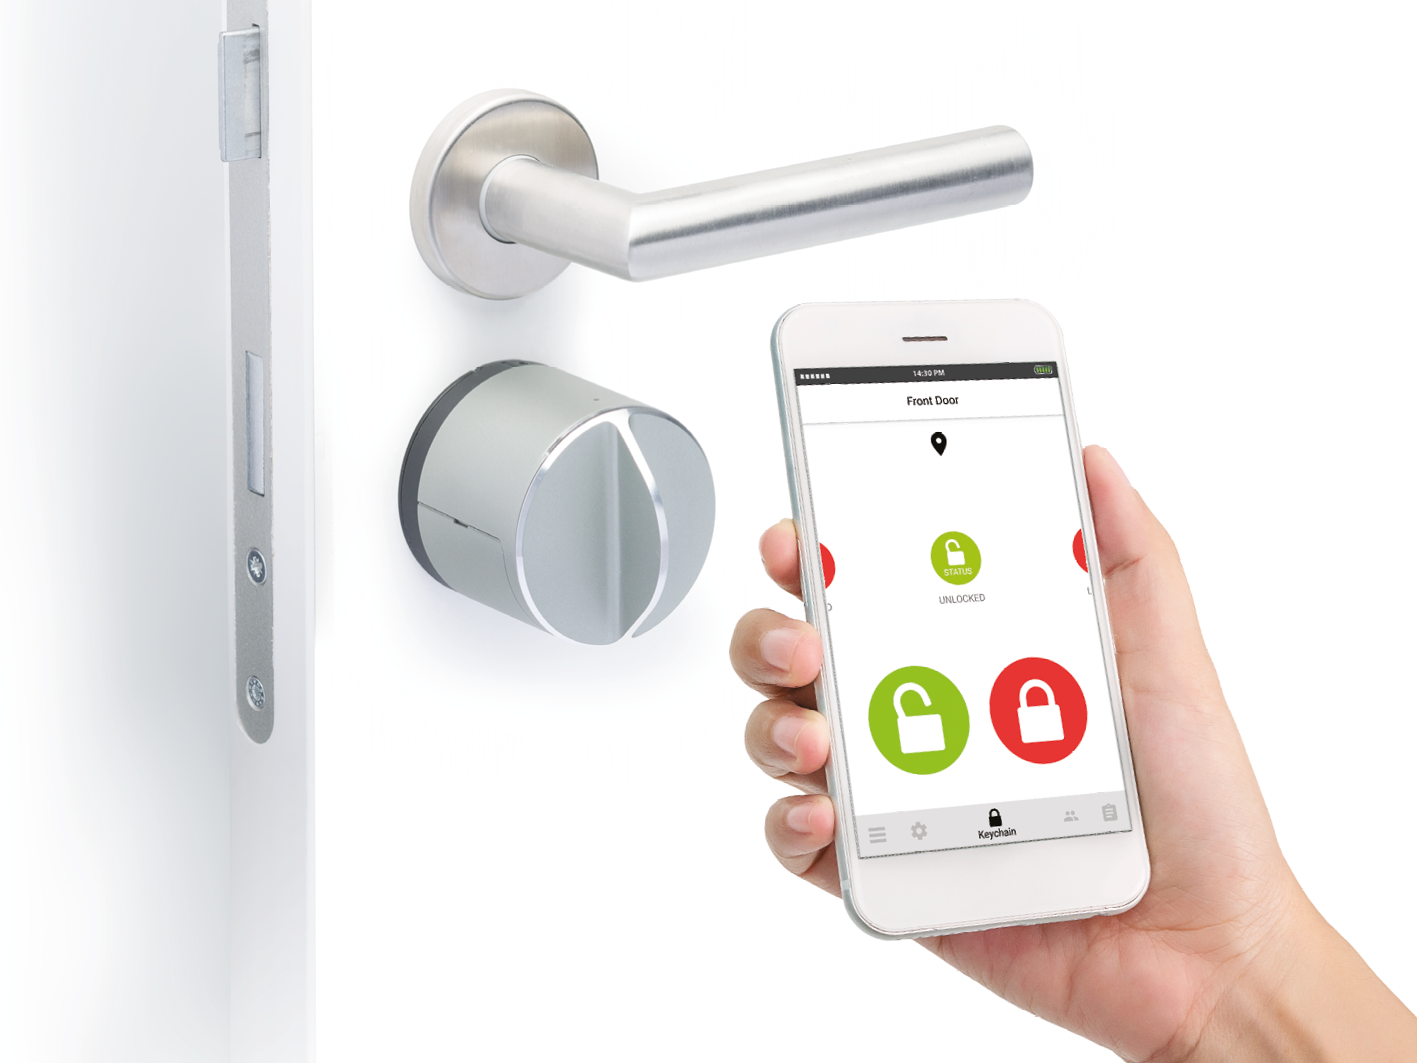 Bra Smart lås Danalock V3 Bluetooth DG-71